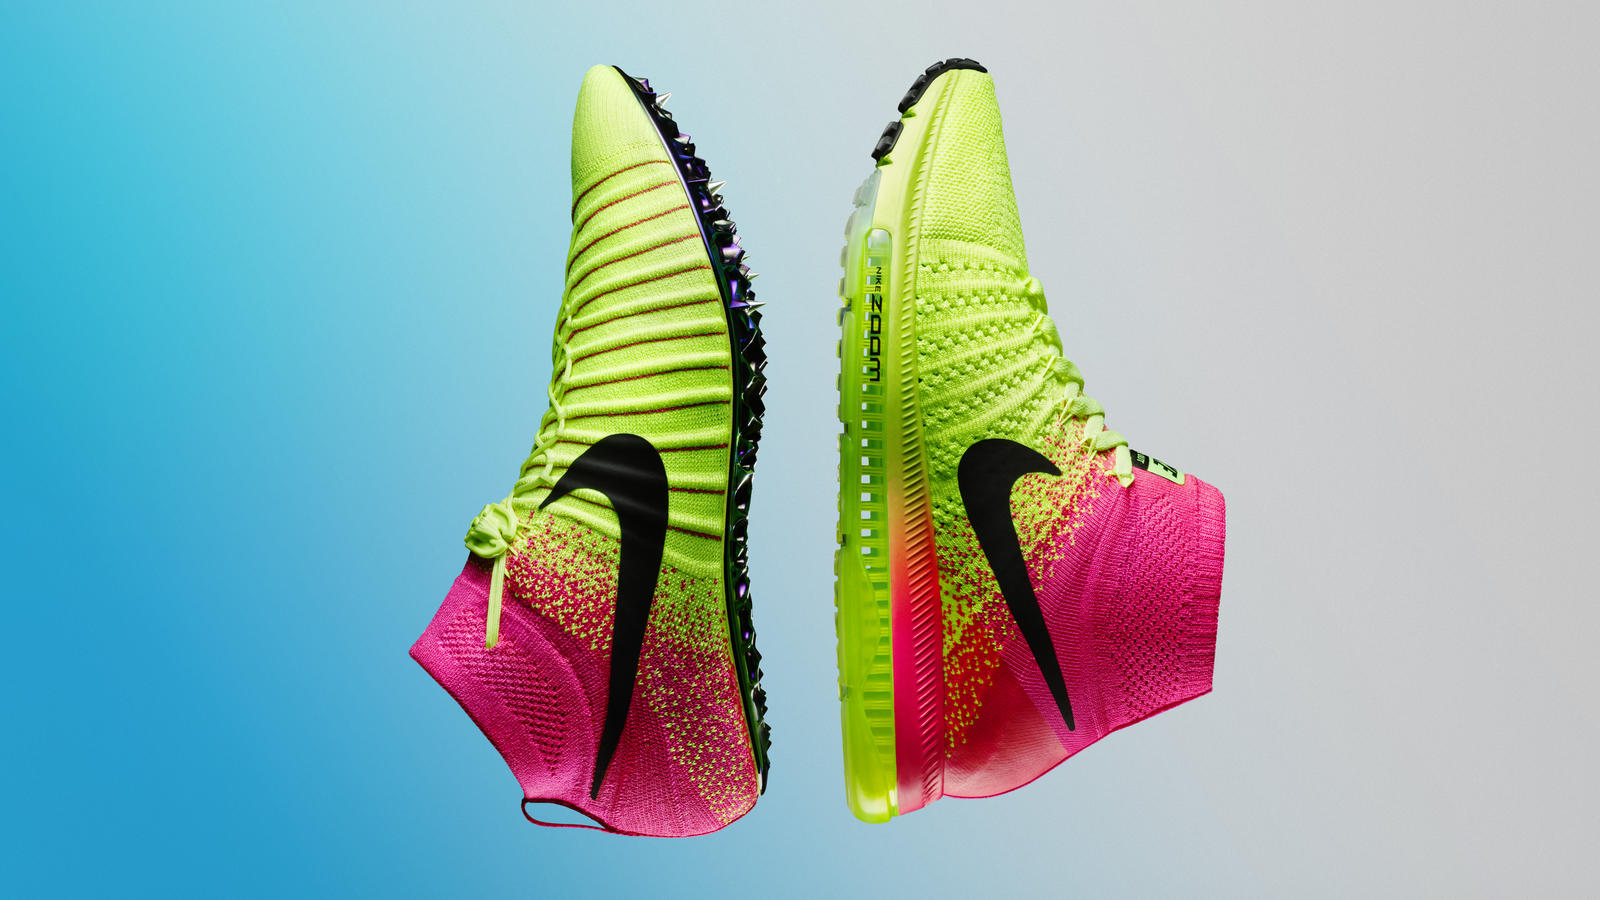 Nike Zeigt Neue Sommer Farben Keller Sports Guide